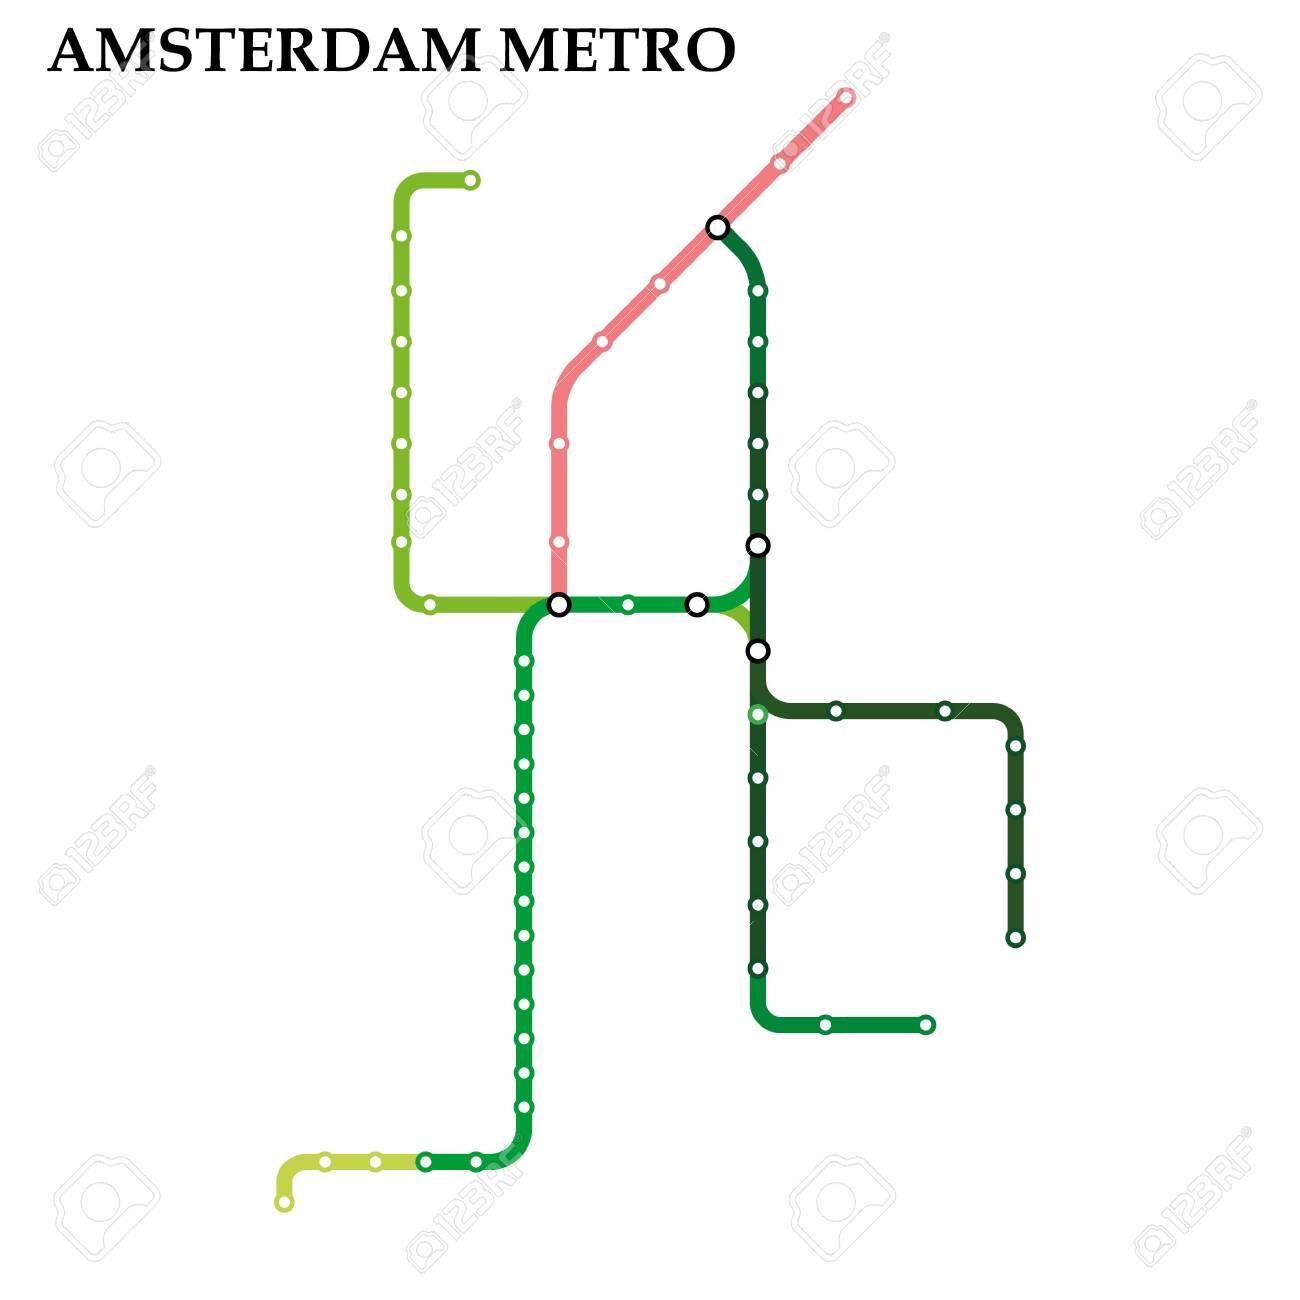 Subway Map Amsterdam.Map Of The Amsterdam Metro Subway Template Of City Transportation